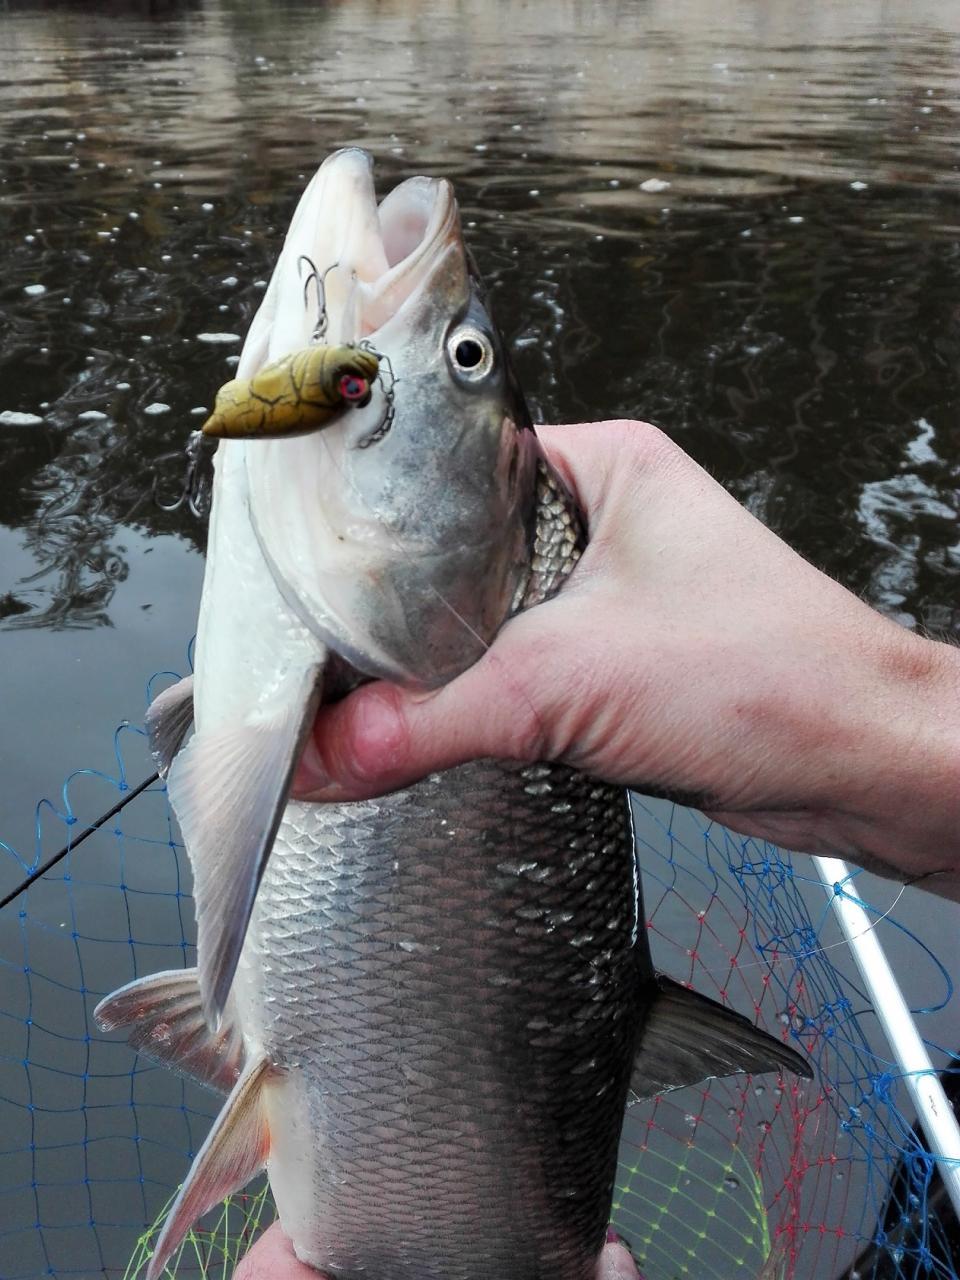 Походу мы с напарником одни на Днепре ловим ... | Отчеты о рыбалке в Беларуси